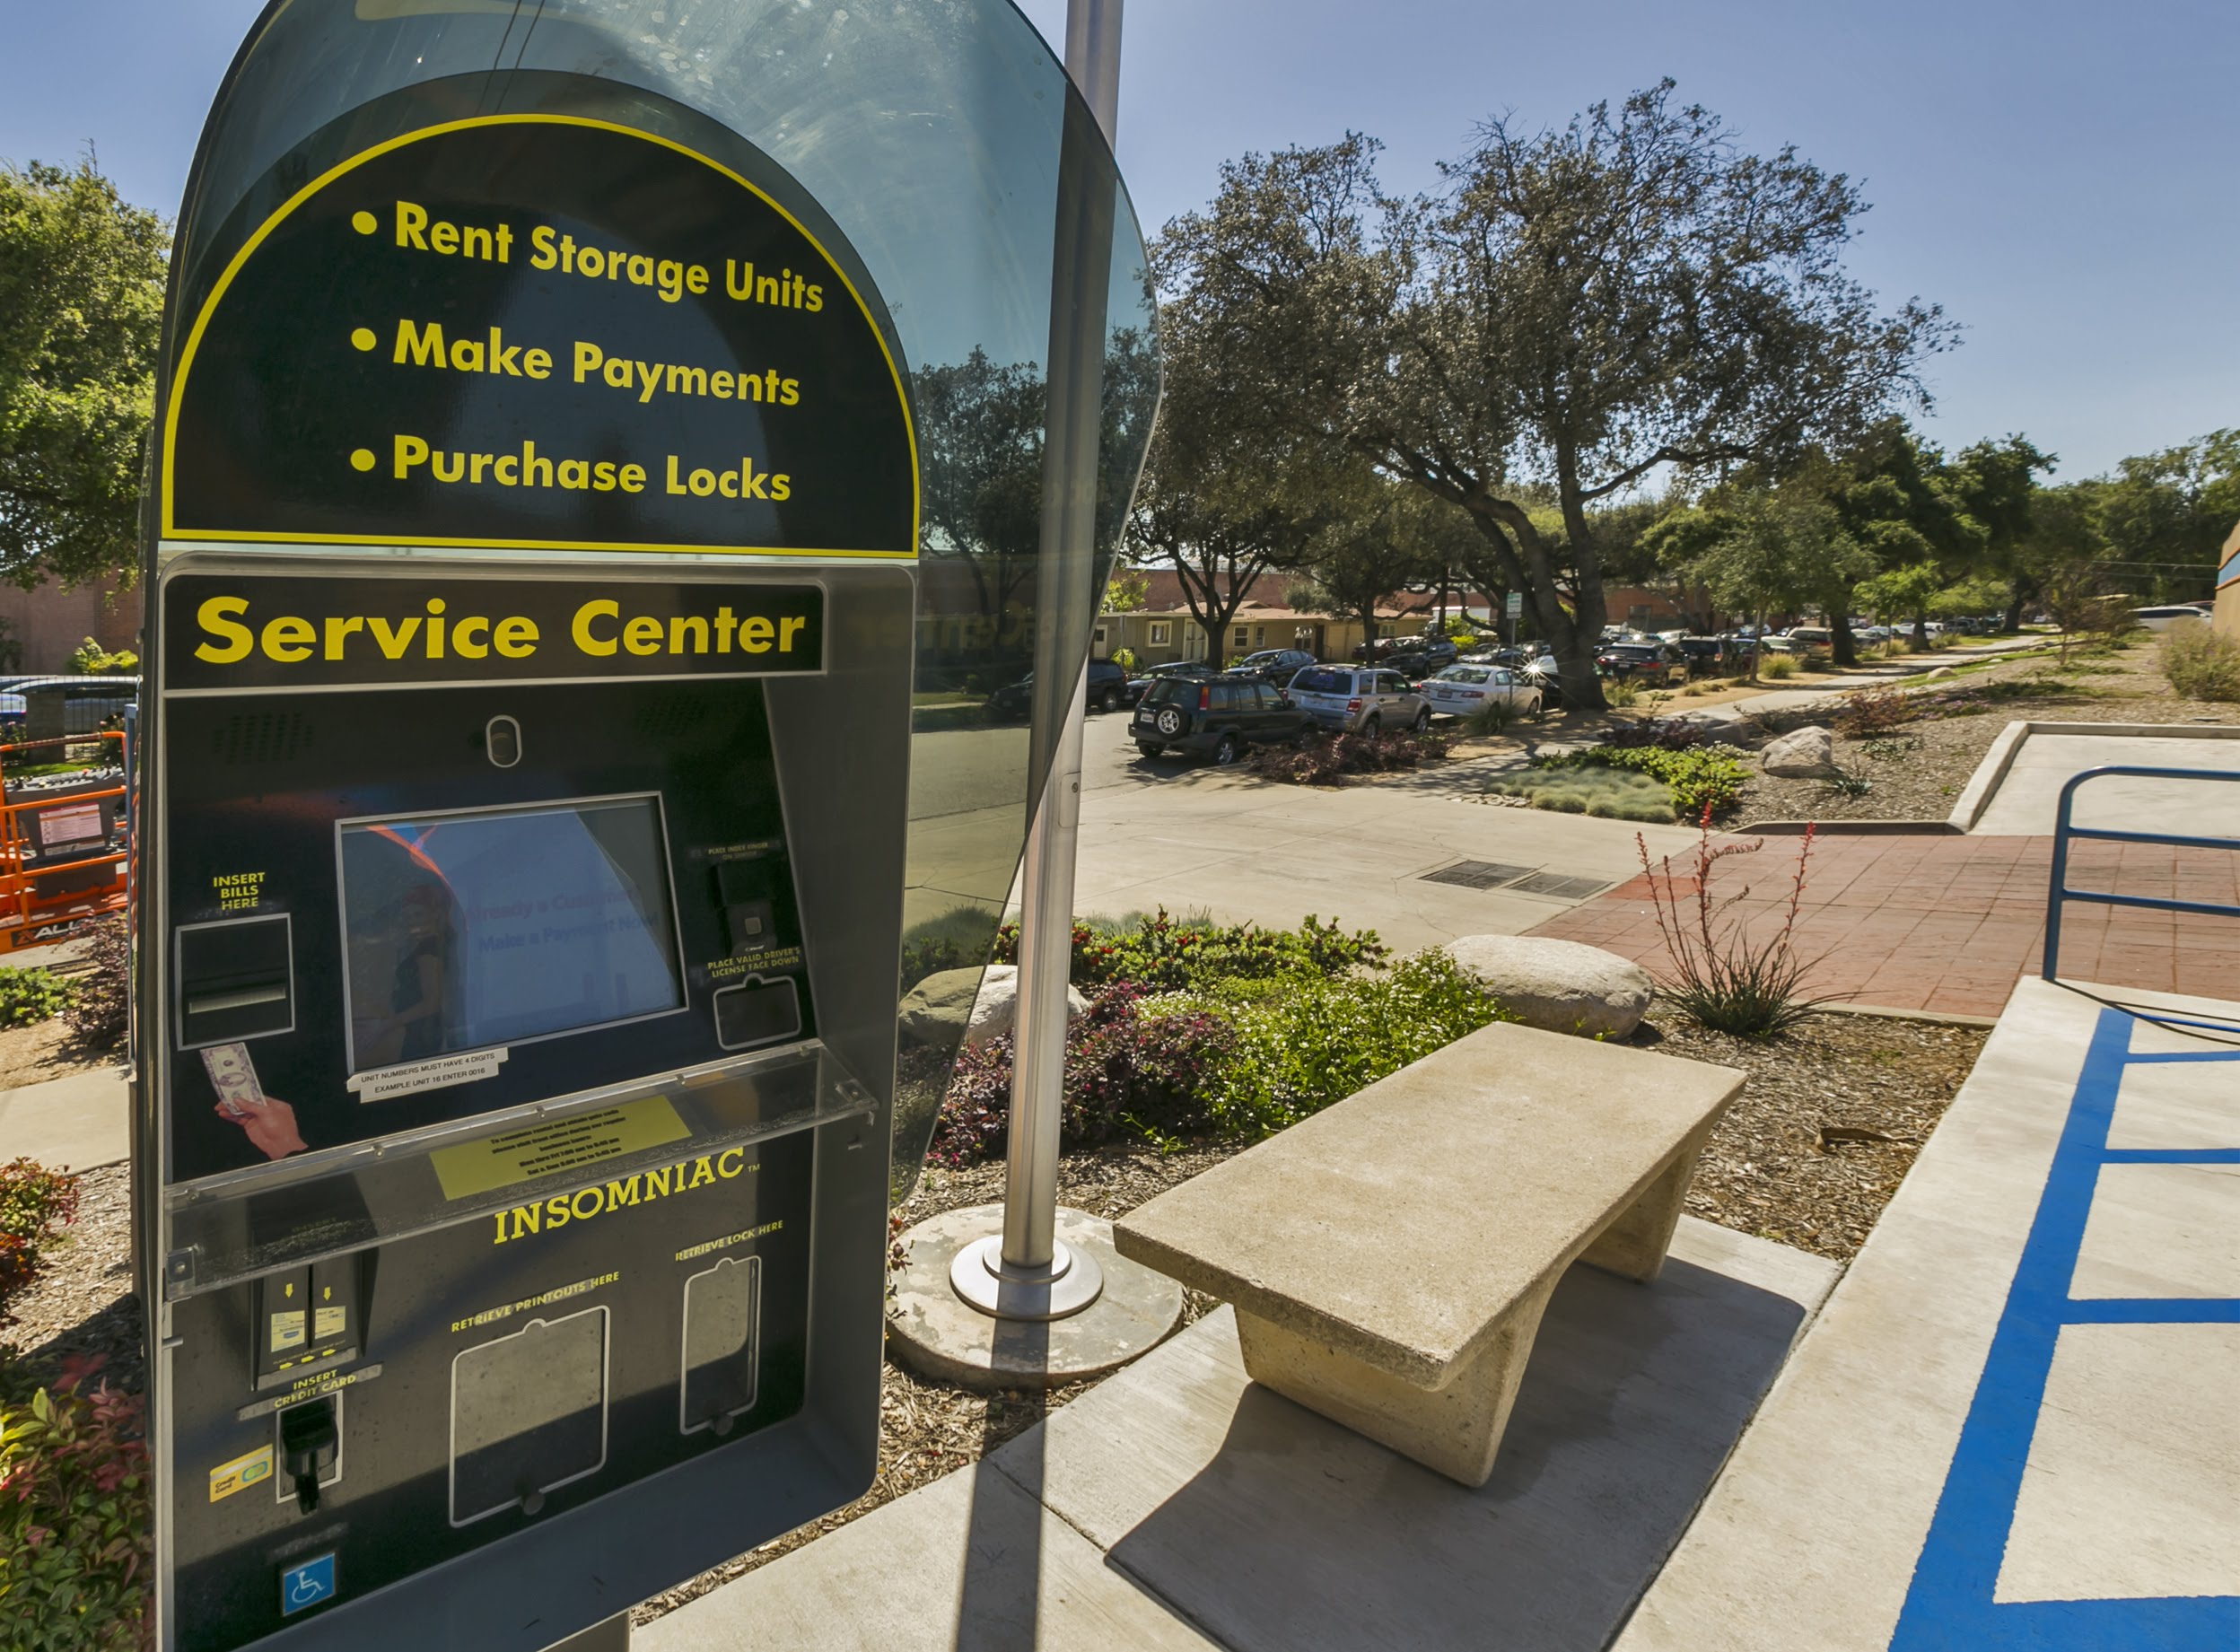 Pouch Self Storage 24 hour self service kiosk